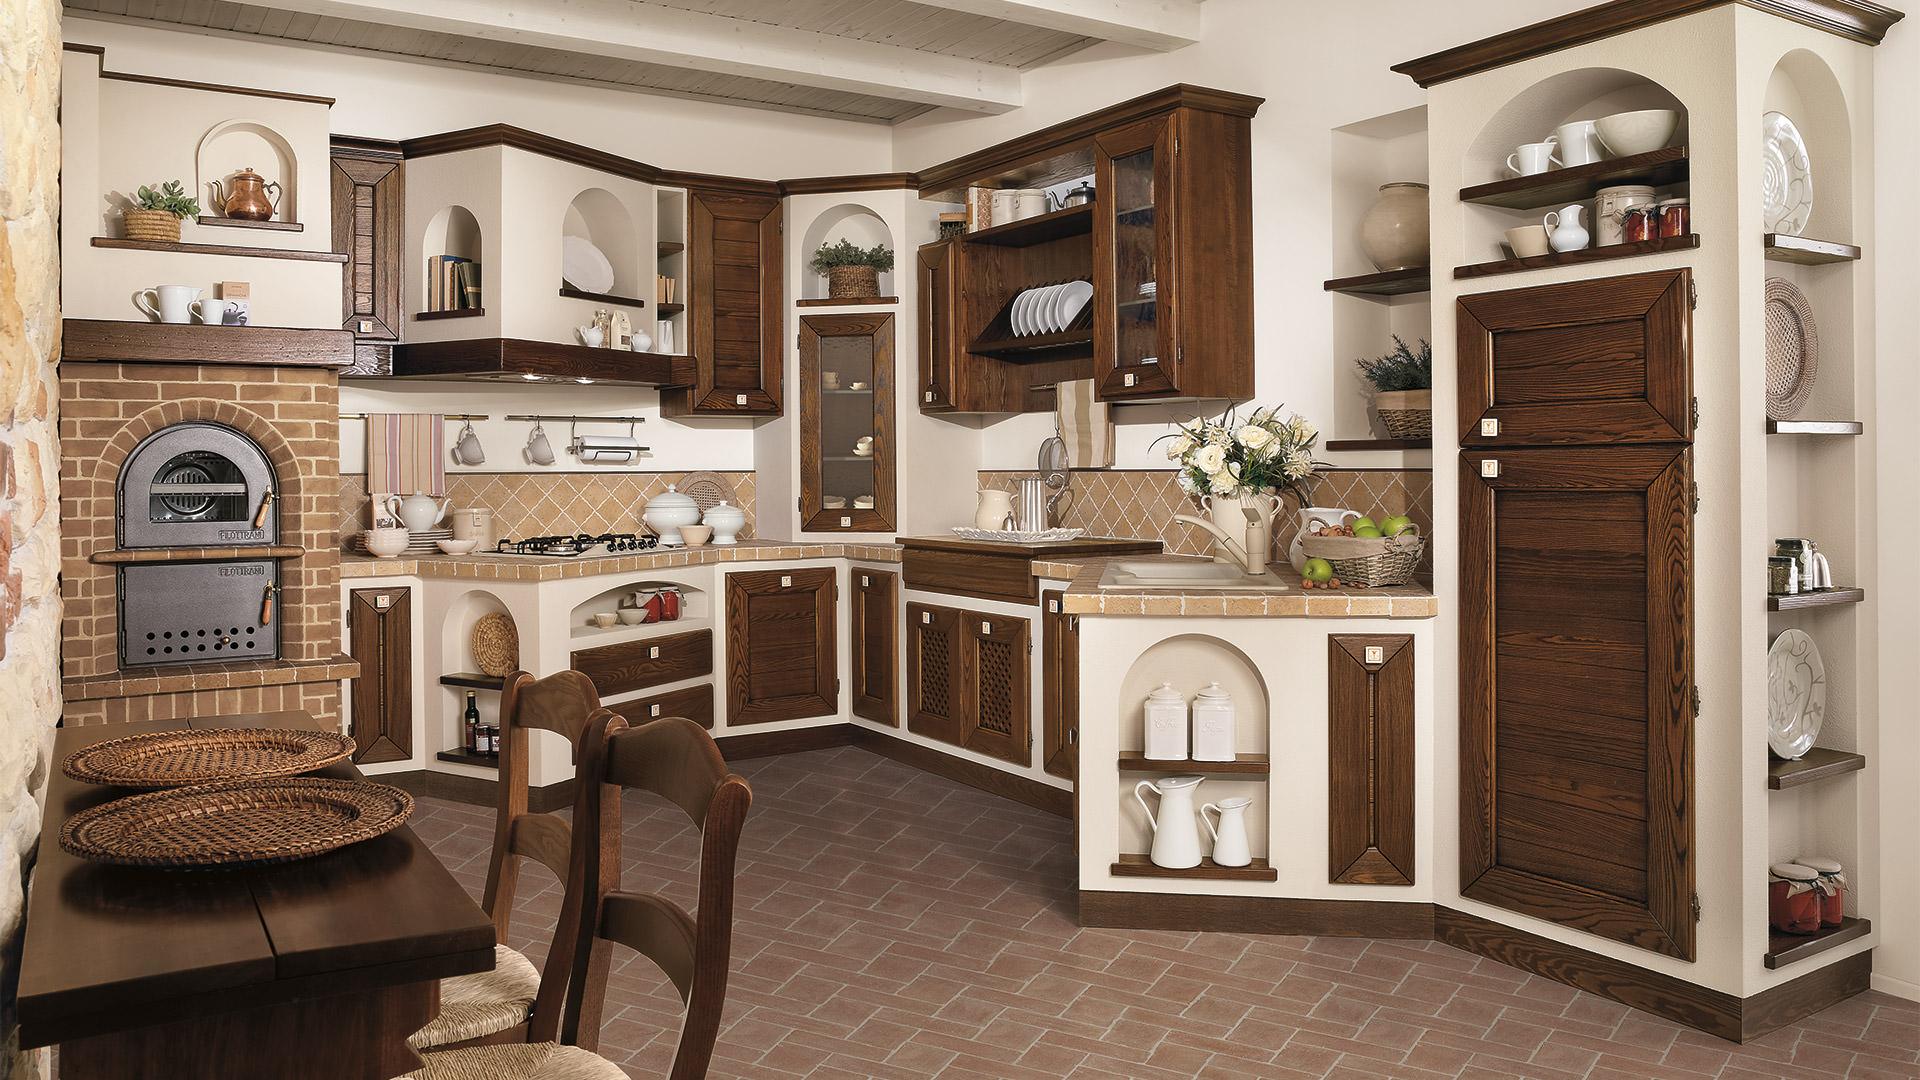 Cucina lube classica contemporanea luisa 2 rafaschieri arredamenti - Cucina lube classica ...